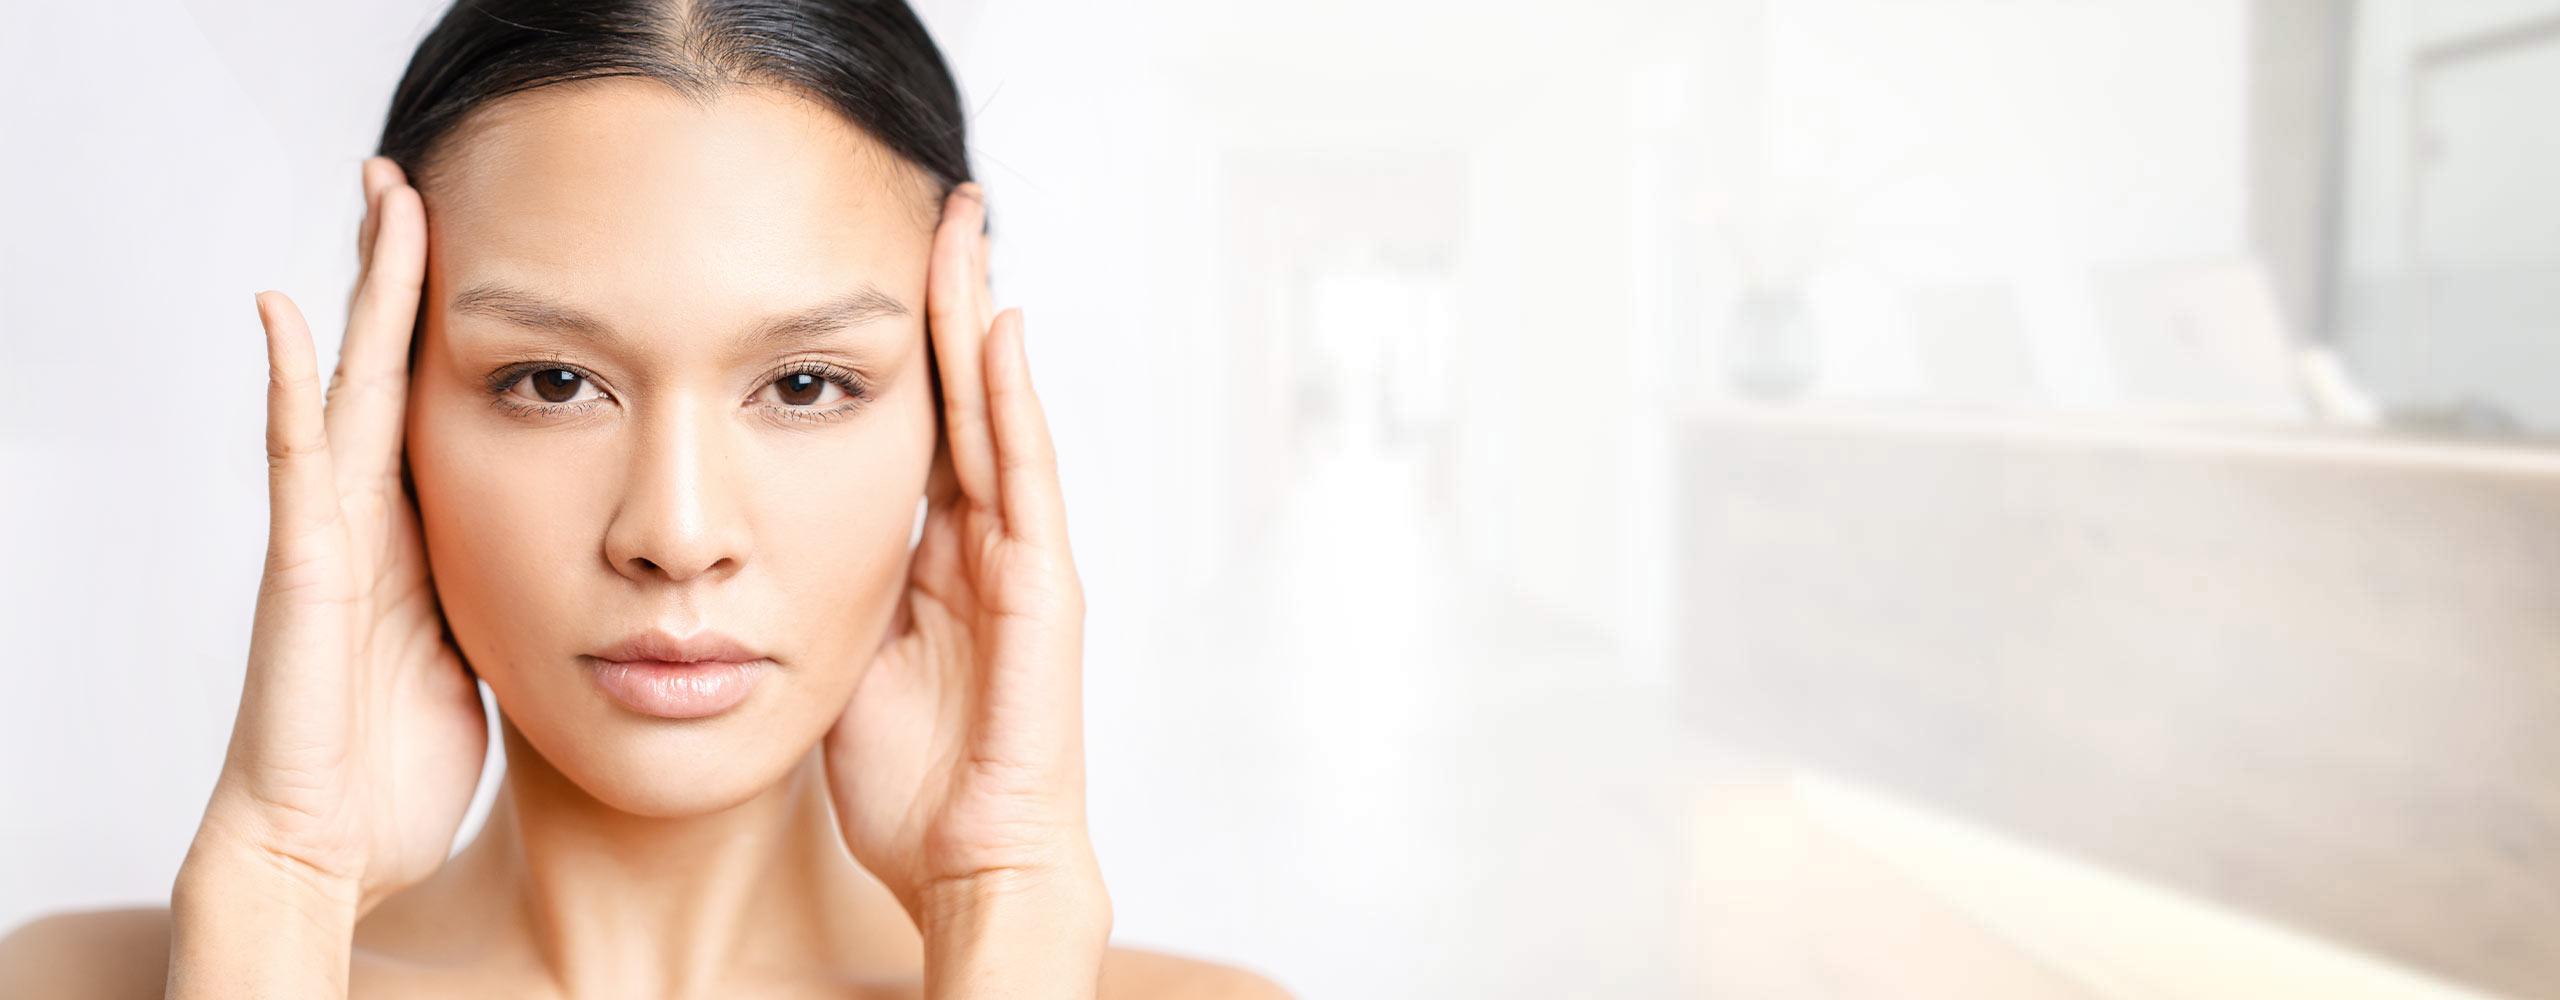 buccal fat removal schoenheitsklinik proaesthetic